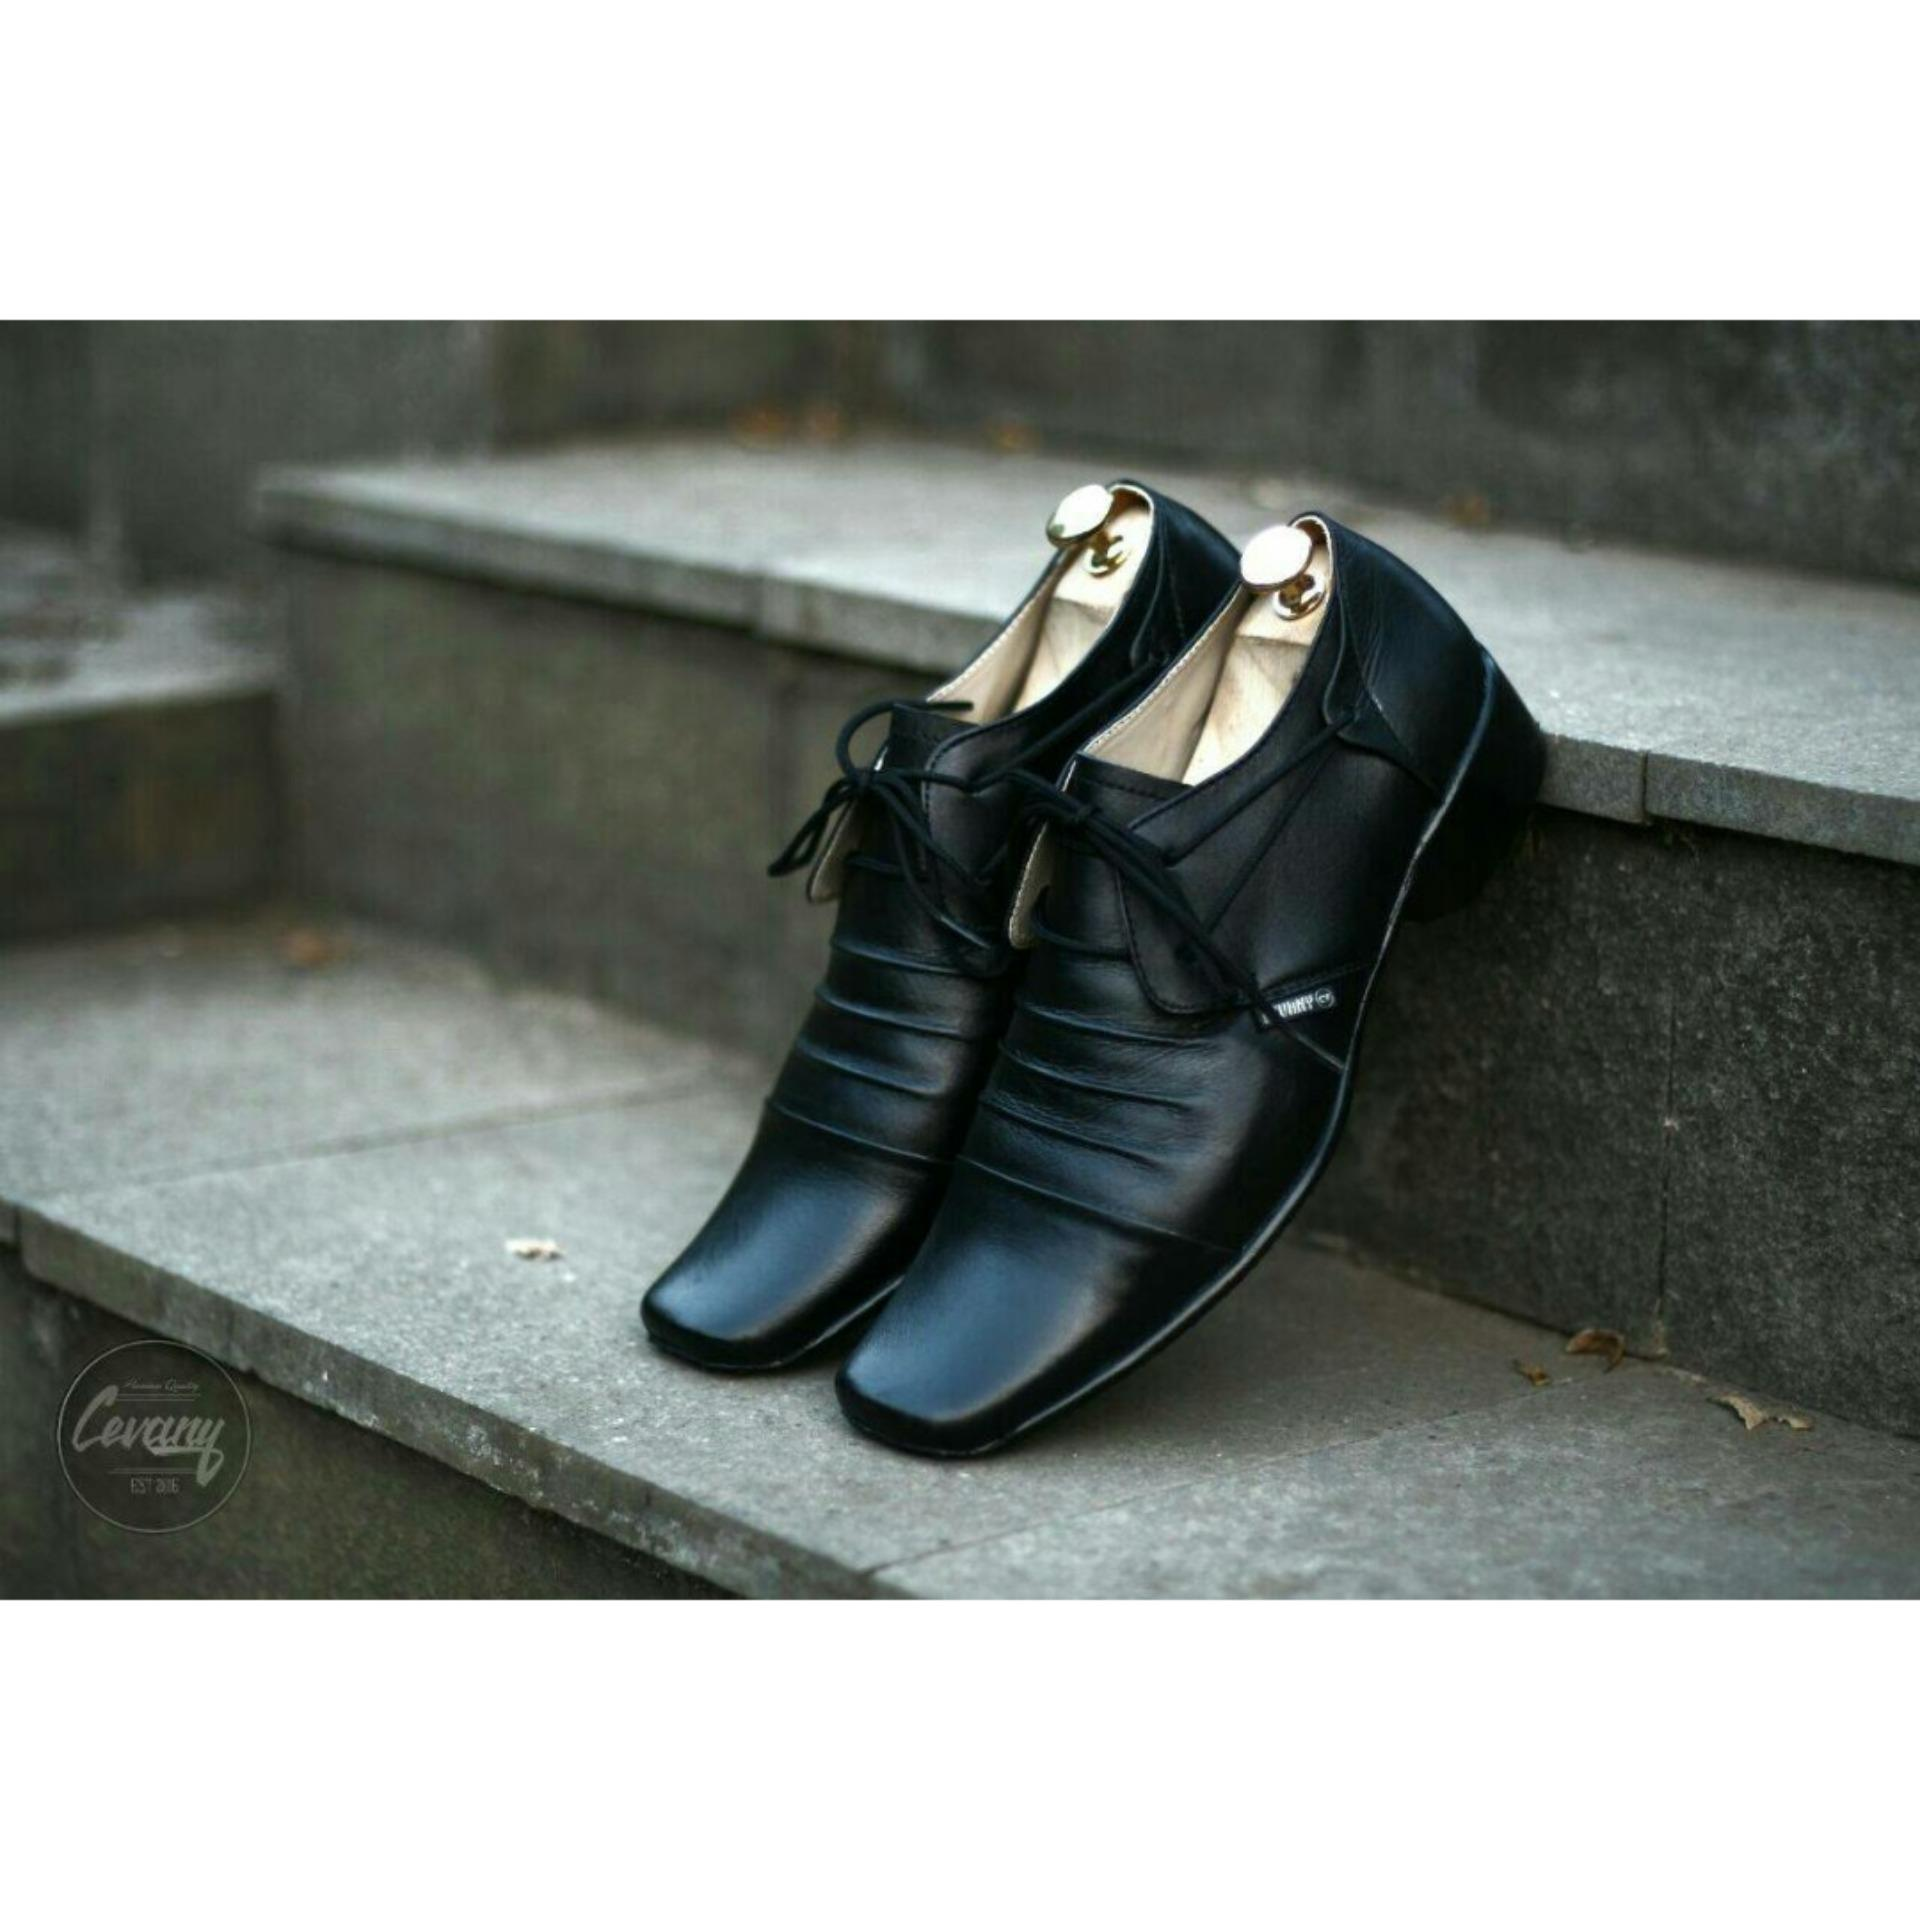 cevany footwear leather shoes man formal busines elegan sepatu pantofel kulit asli orginal premium quality (